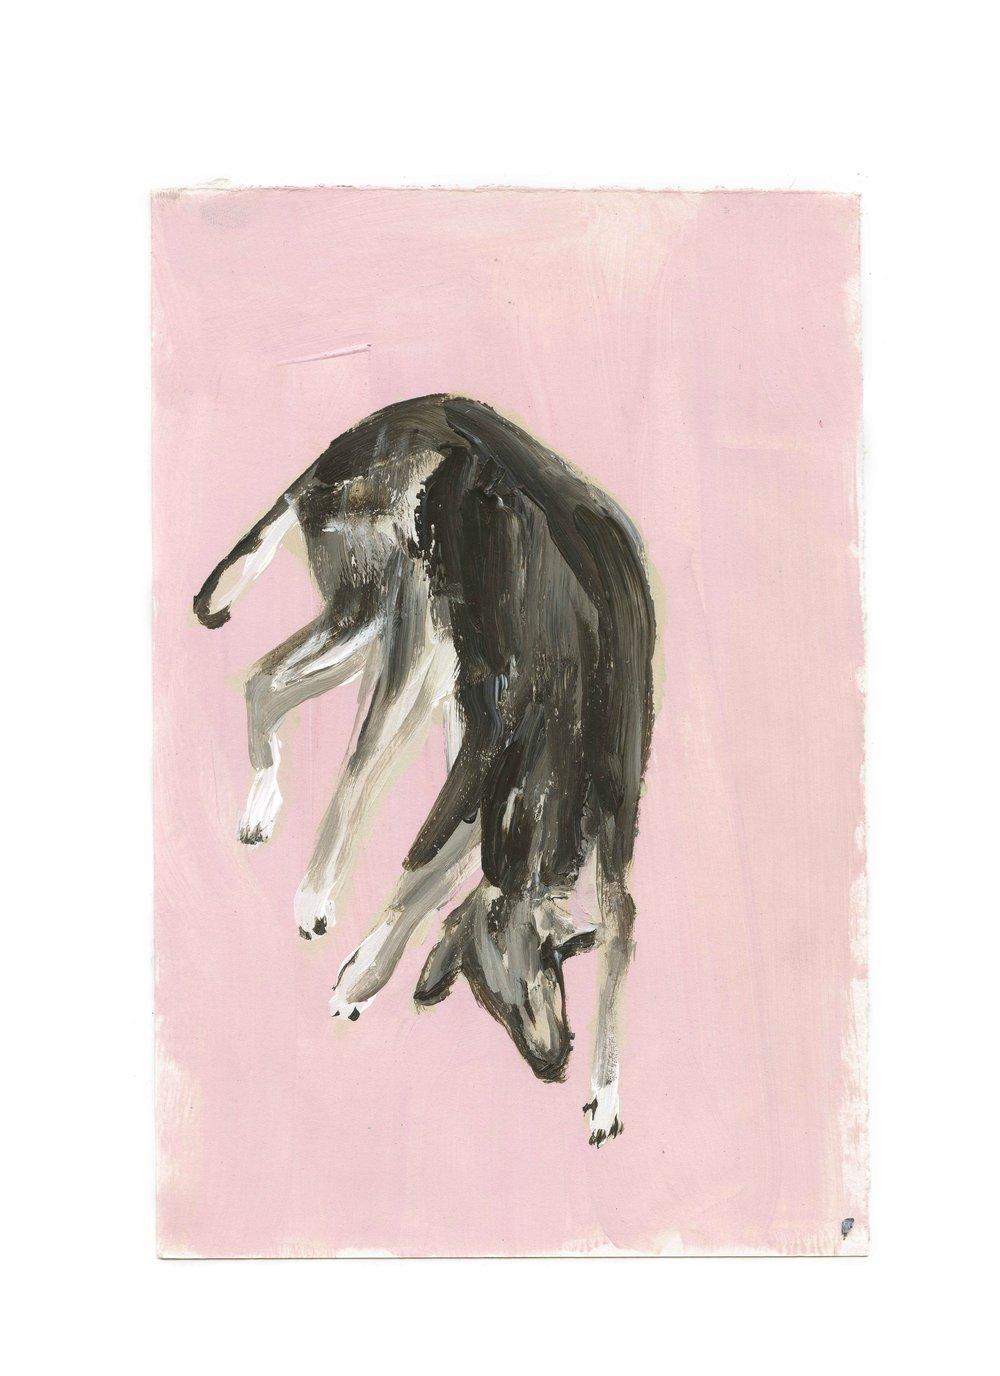 Asahi(dog)II-WEB.jpg